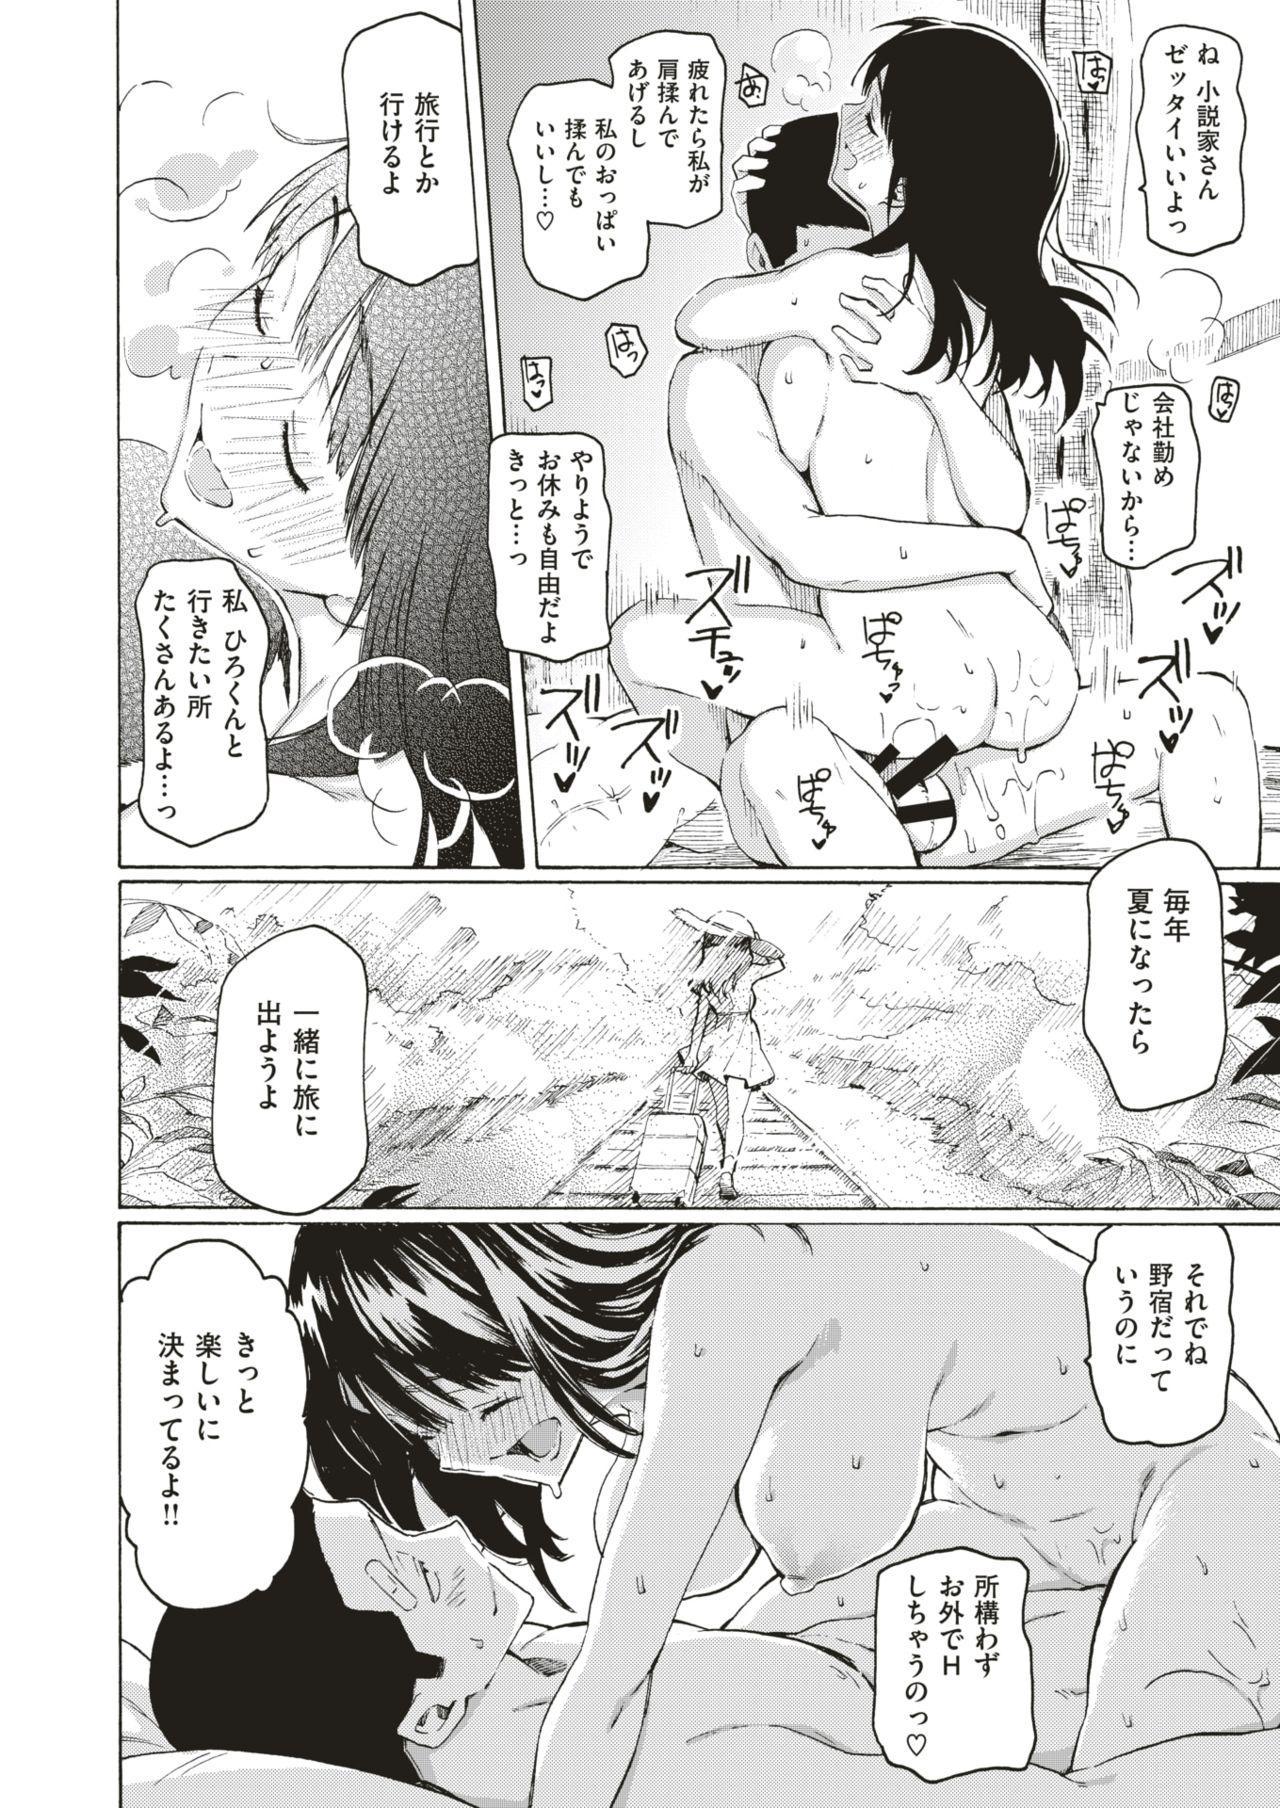 COMIC HAPPINING Vol. 4 6